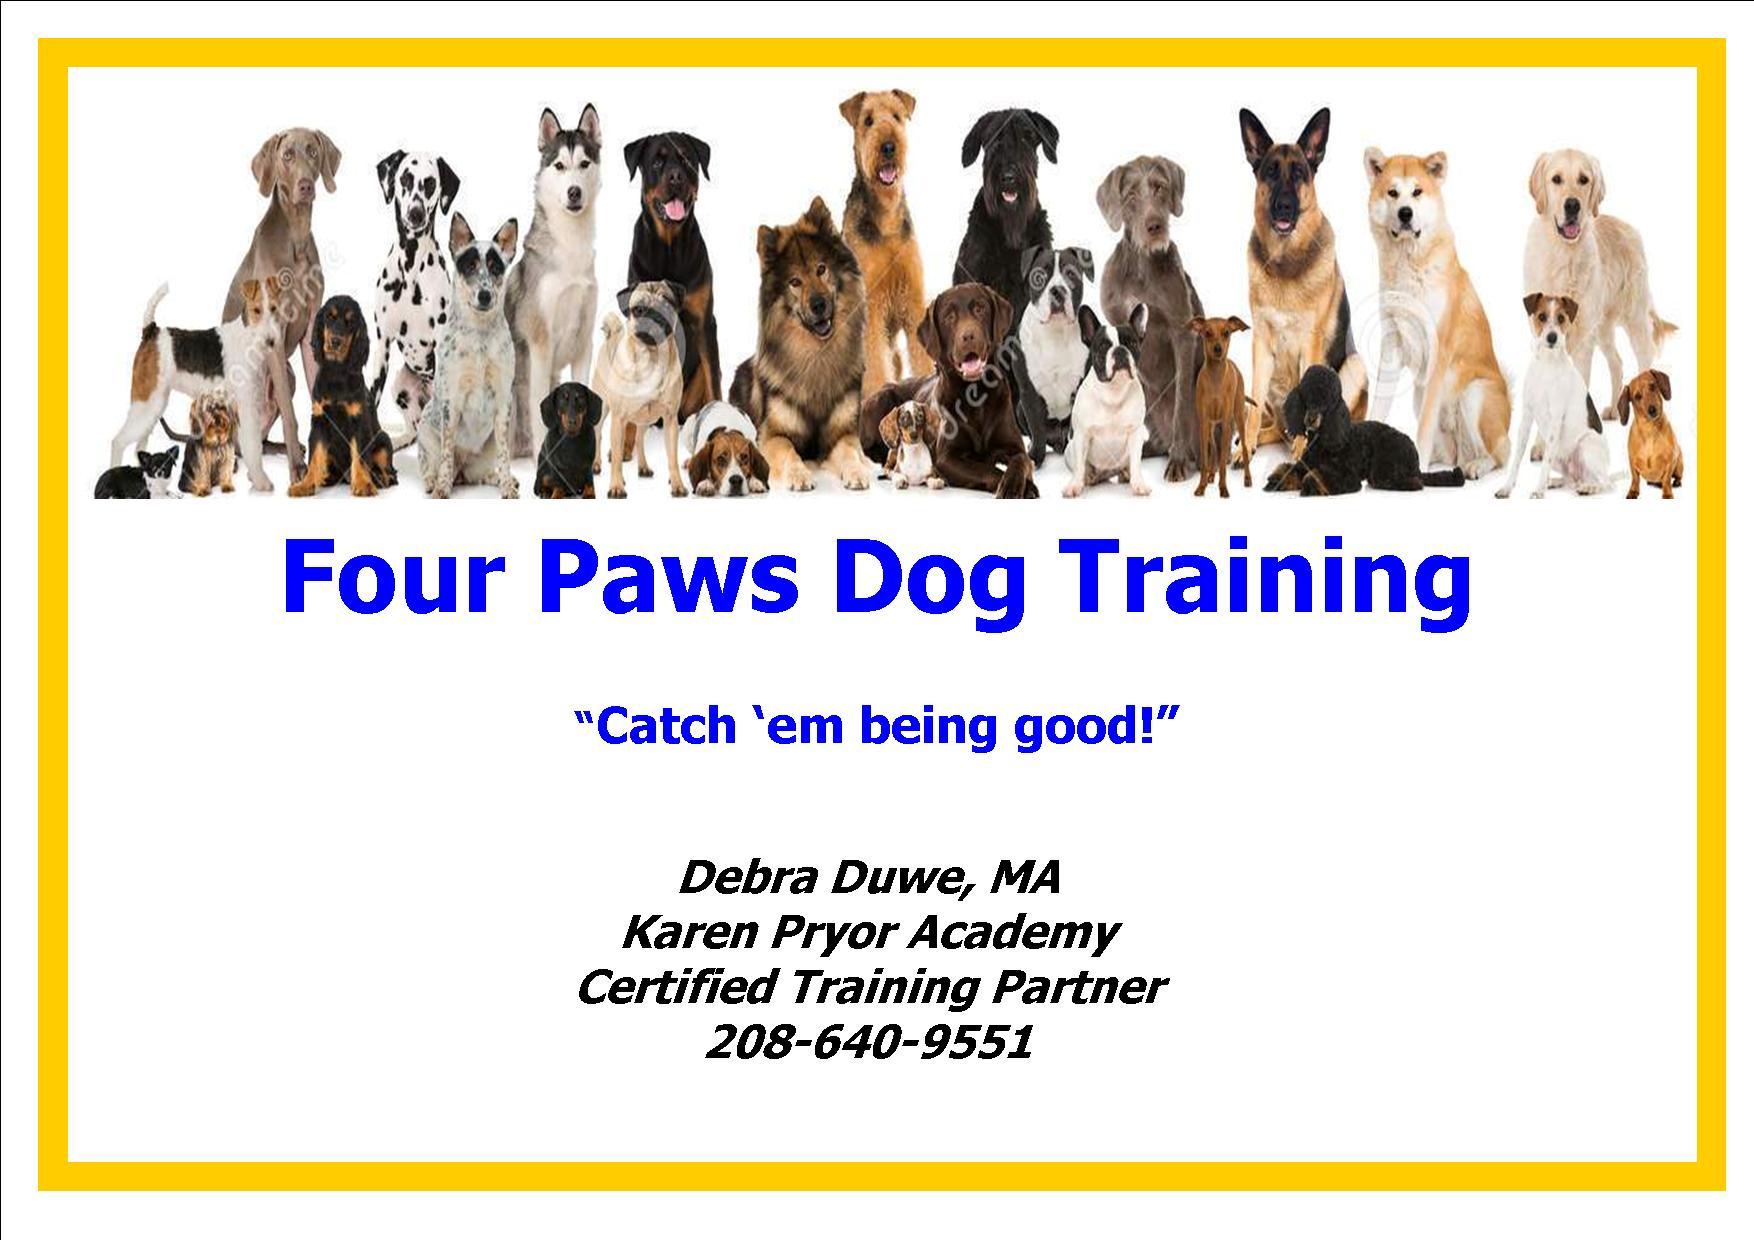 Four Paws Dog Training